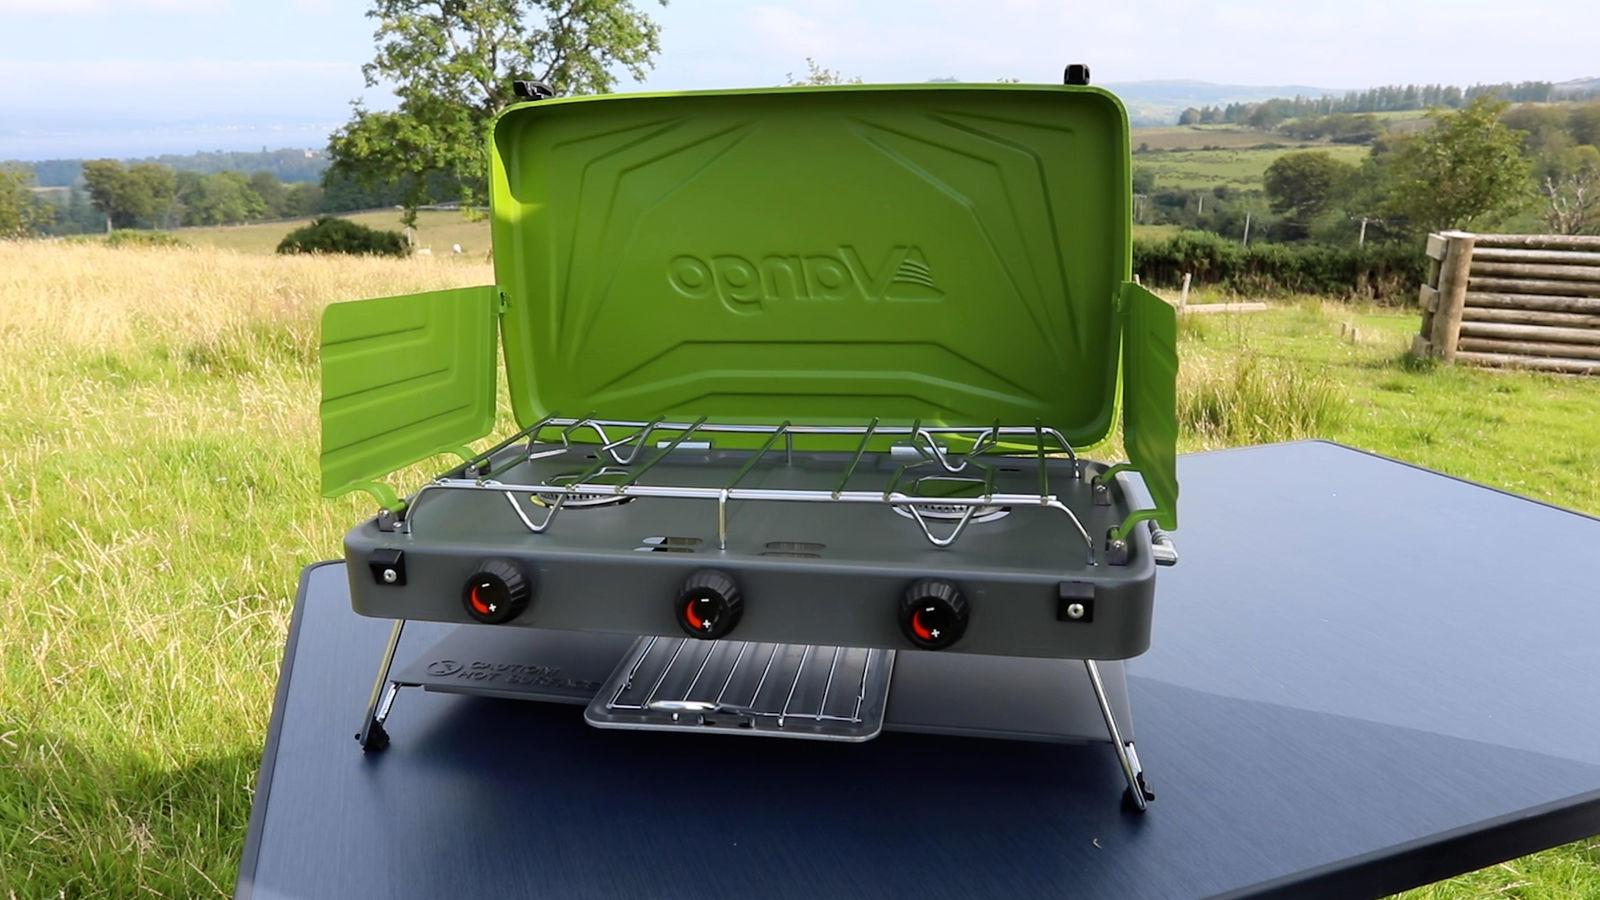 Vango Combi Ir Grill Compact 2021 Norwich Camping 1